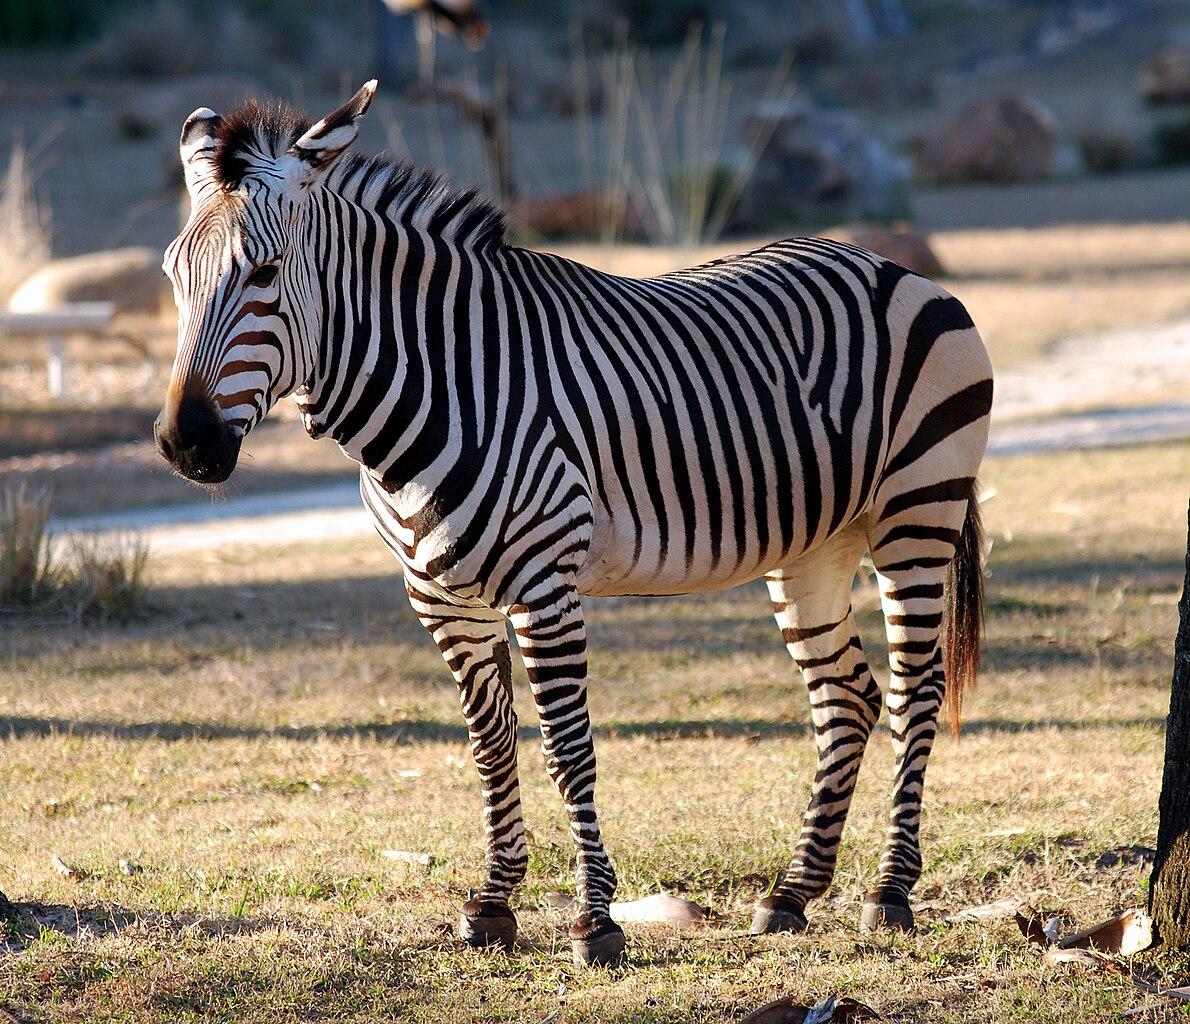 zebra animal usa florida kingdom disney equus orlando lodge file type 2410 wikimedia commons 2800 wikipedia wiki pixels